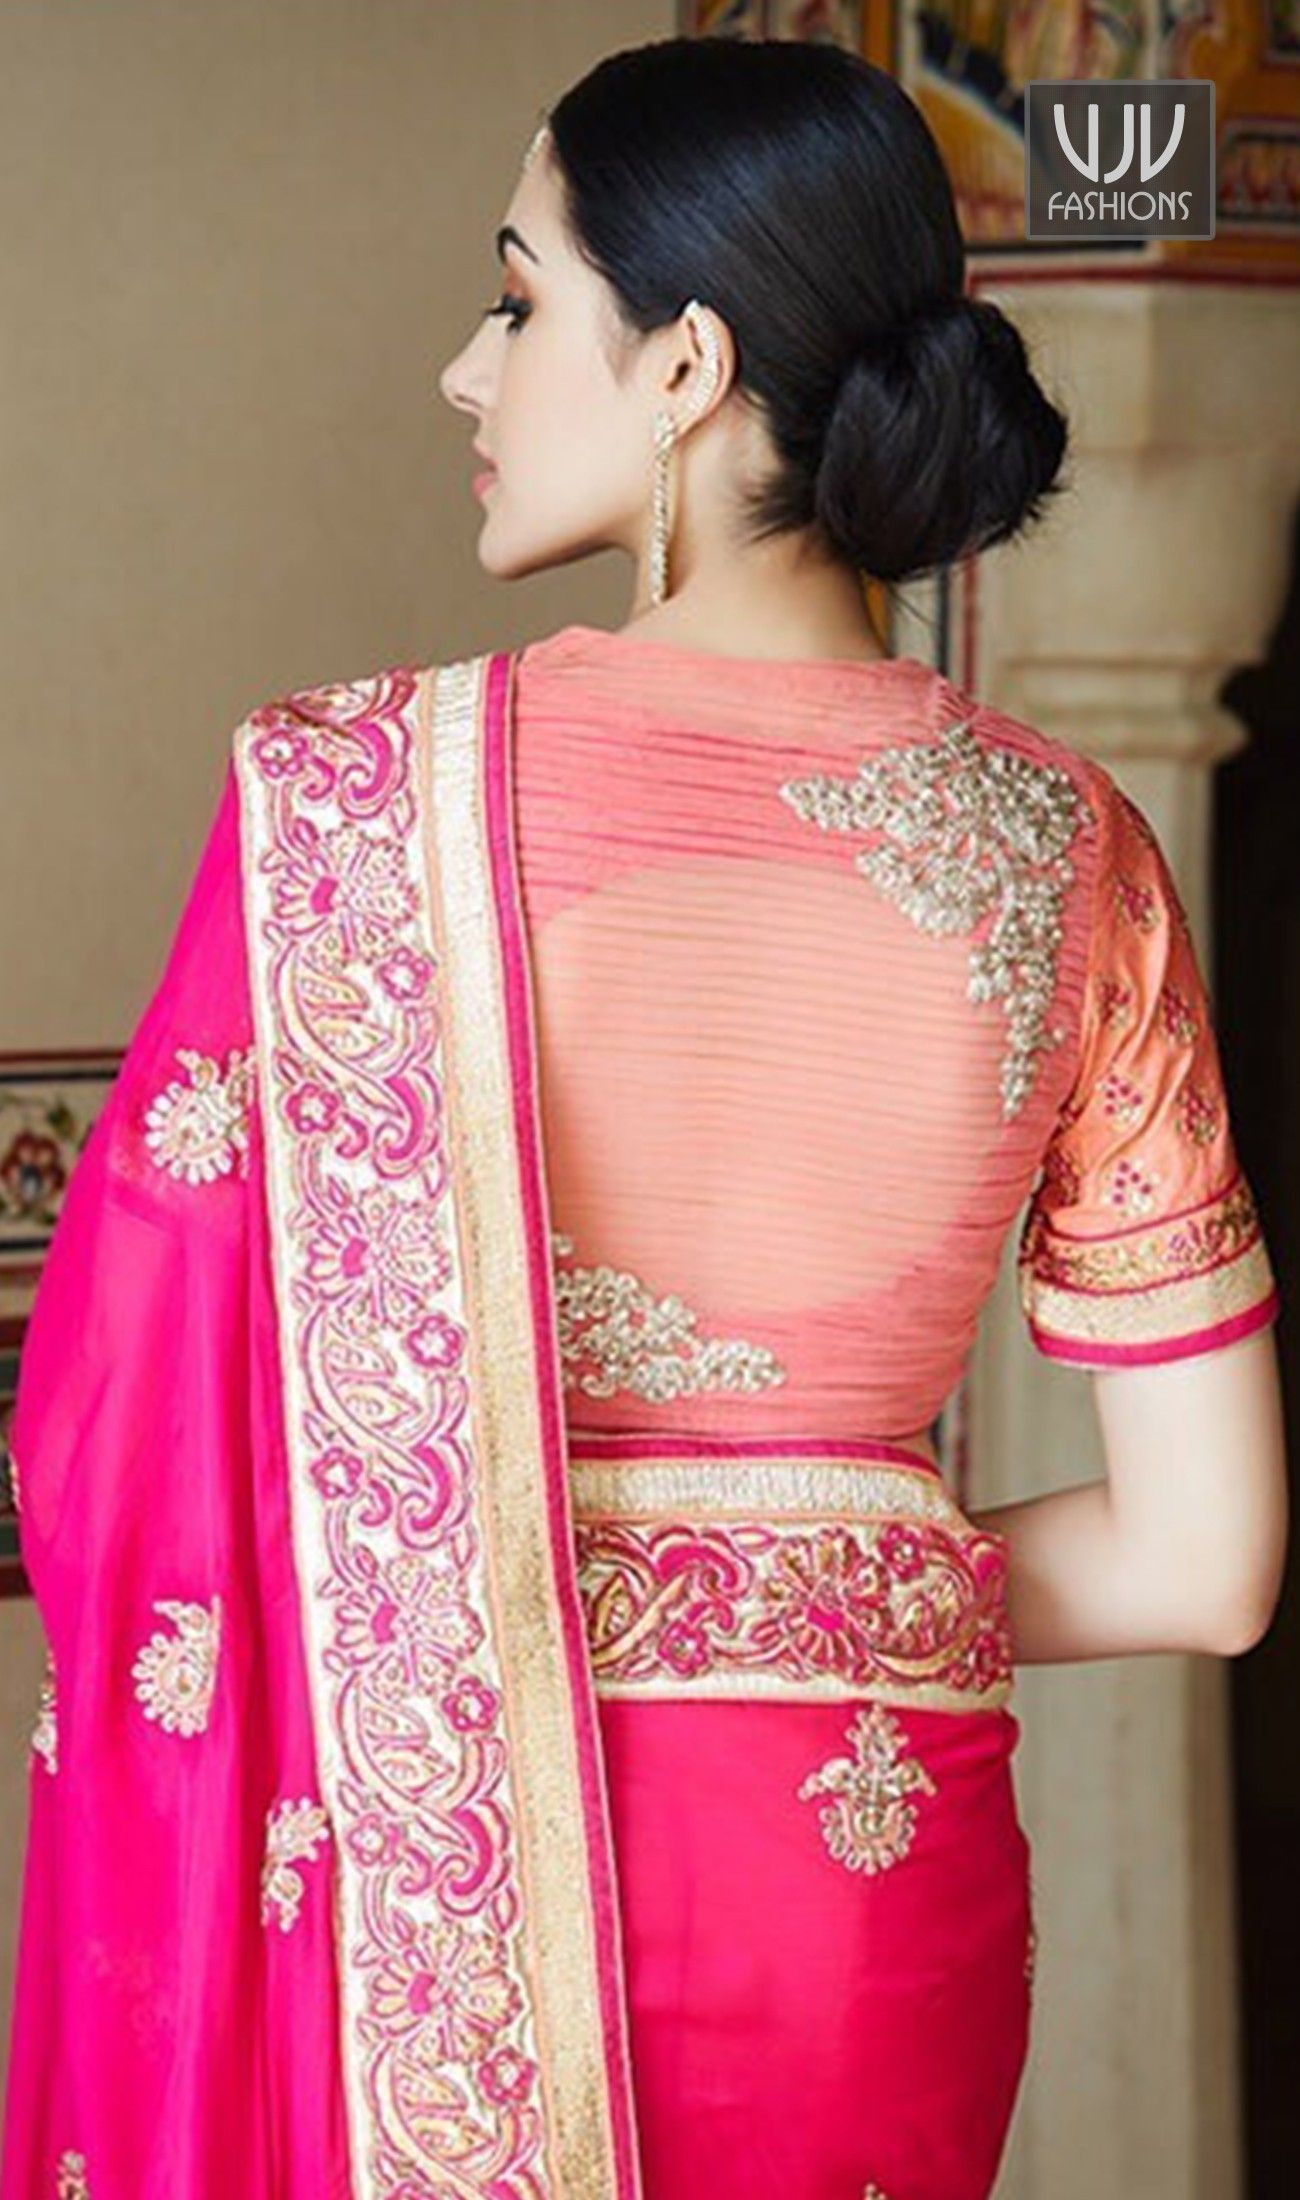 Pin by radhika999 on indian saree designs | Pinterest ...